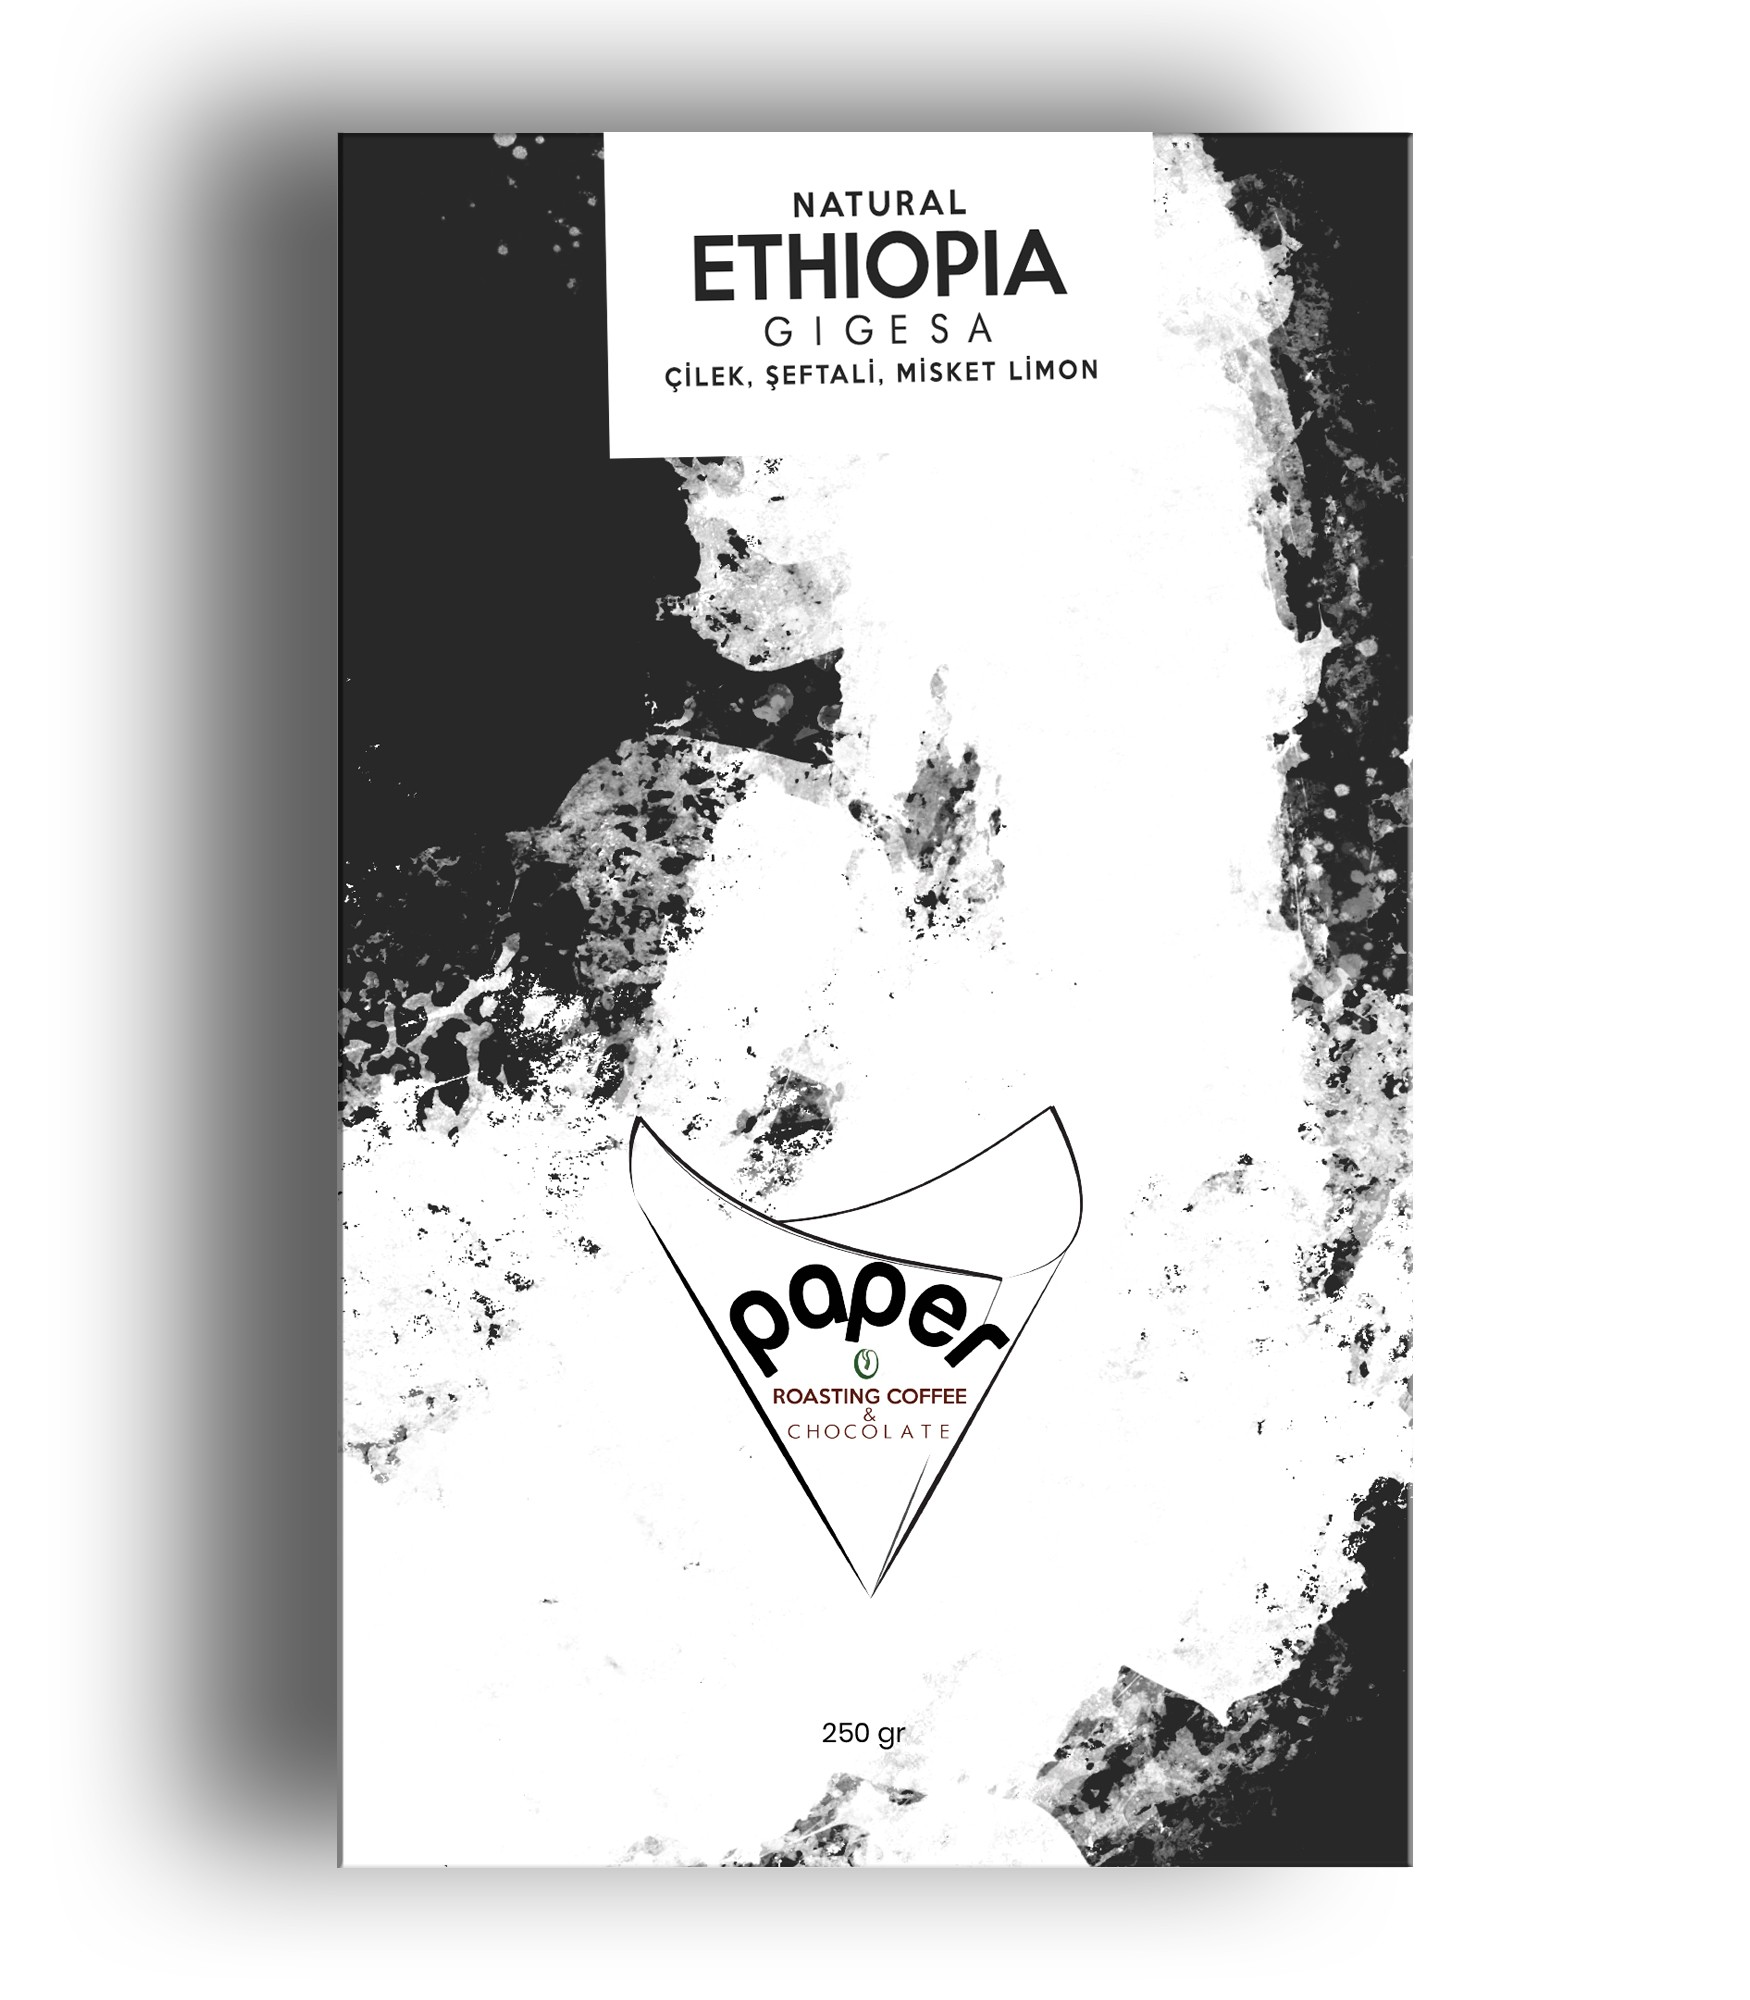 Ethiopia Gigesa Natural